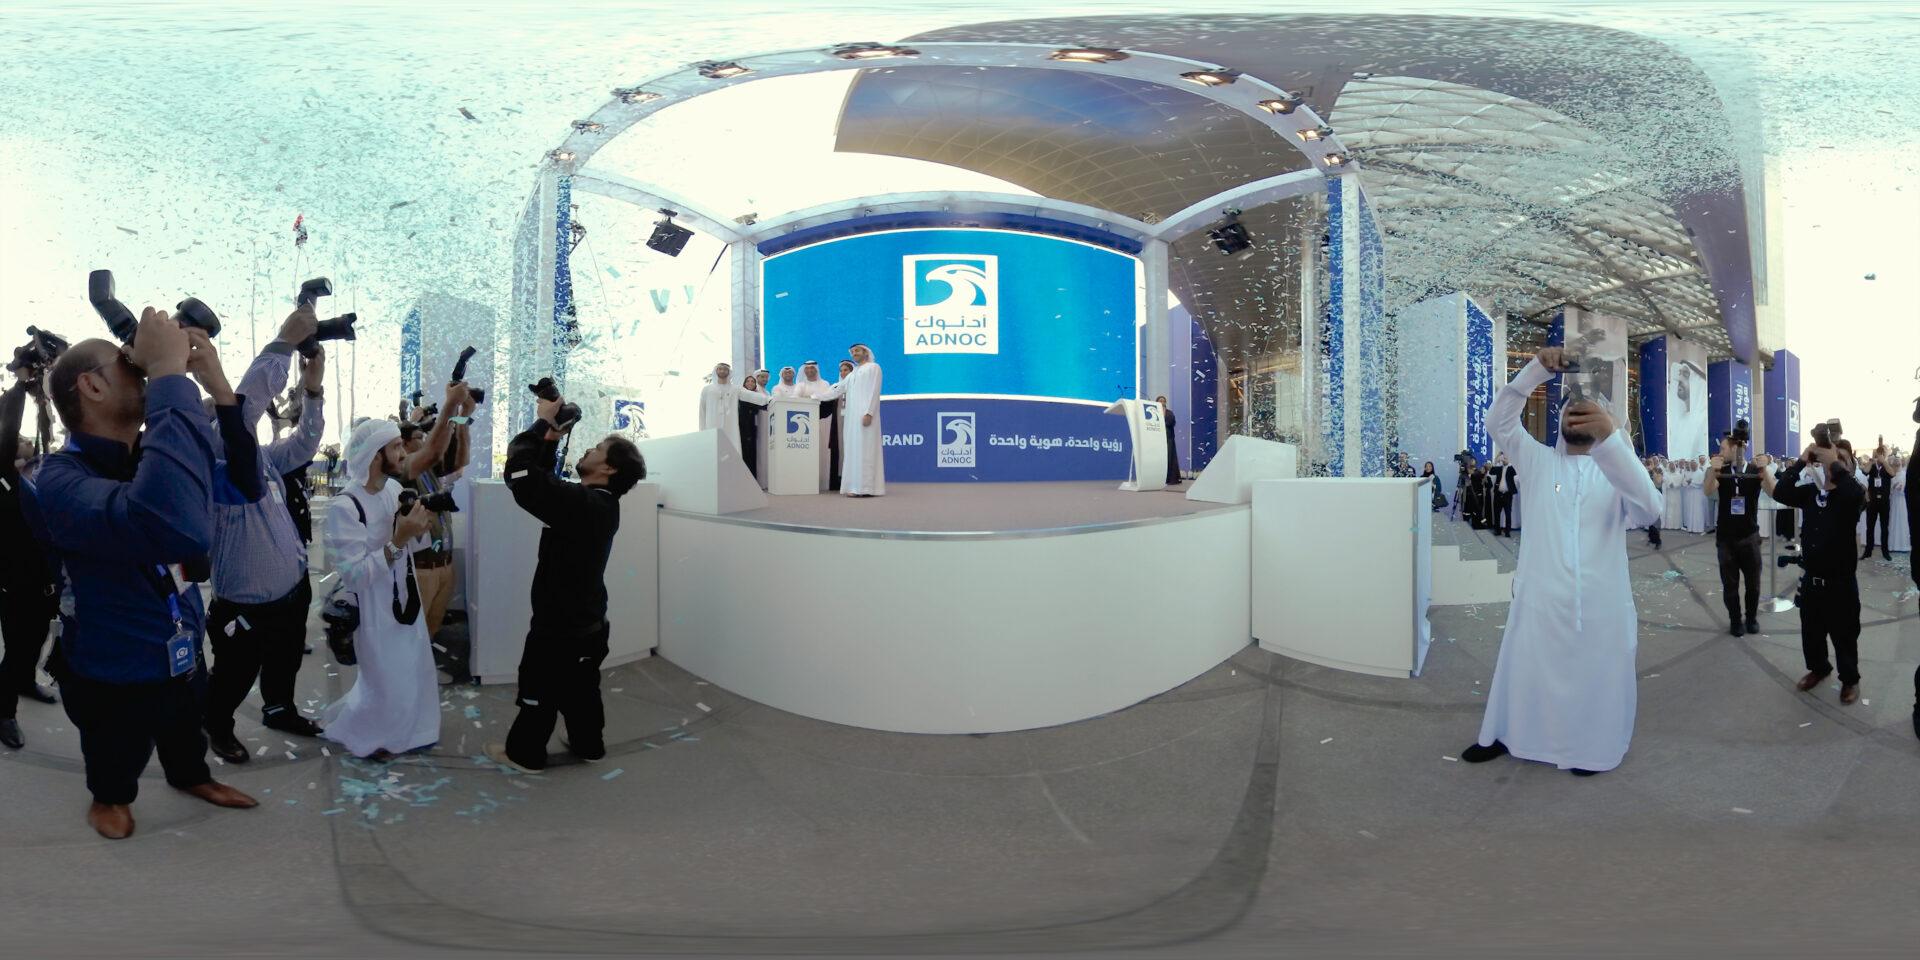 augmented-360-reel-8k-rev3-0010502